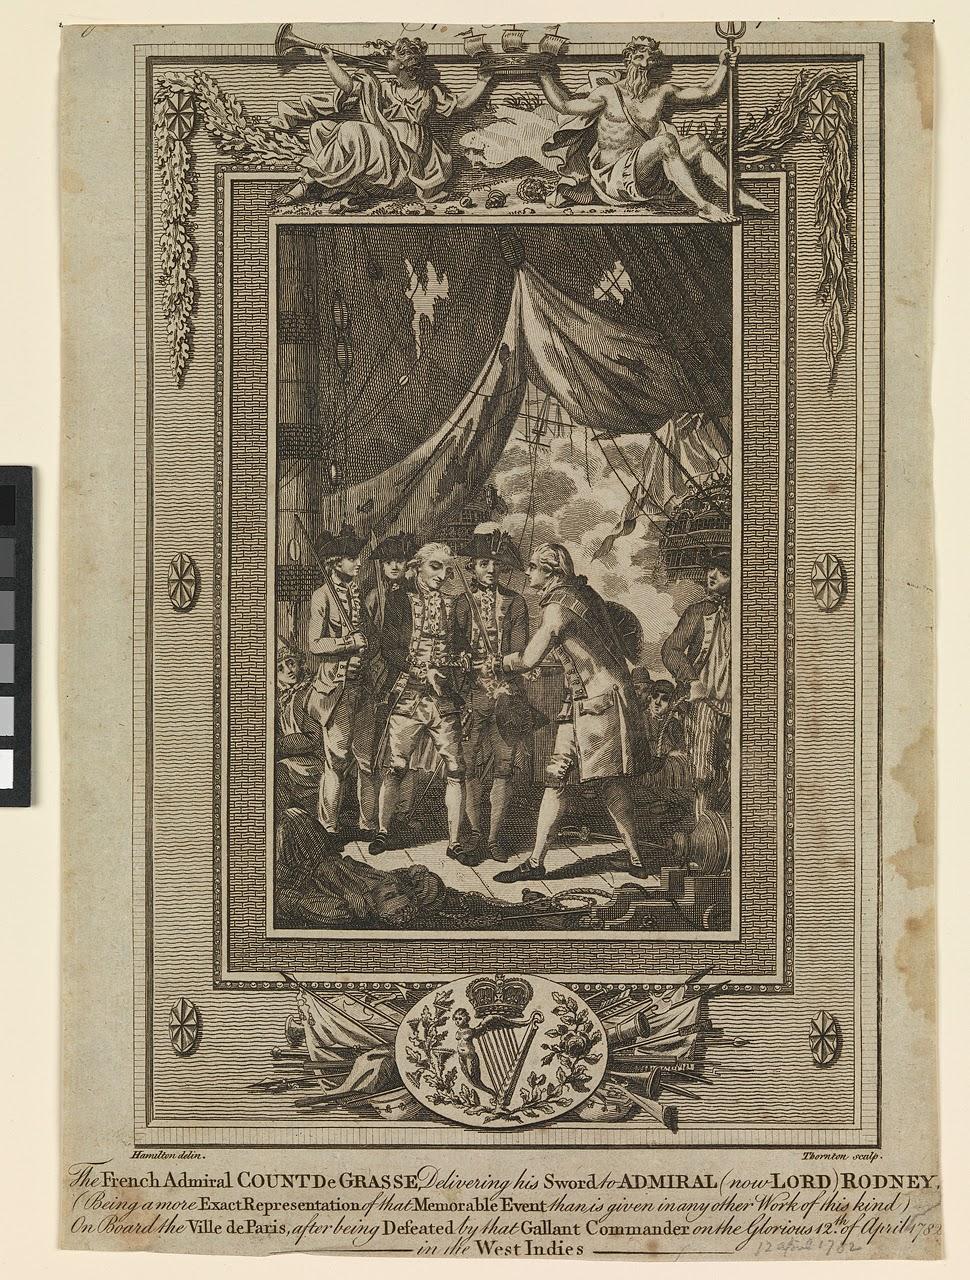 British Tars, 1740-1790: The French Admiral Count De Grasse